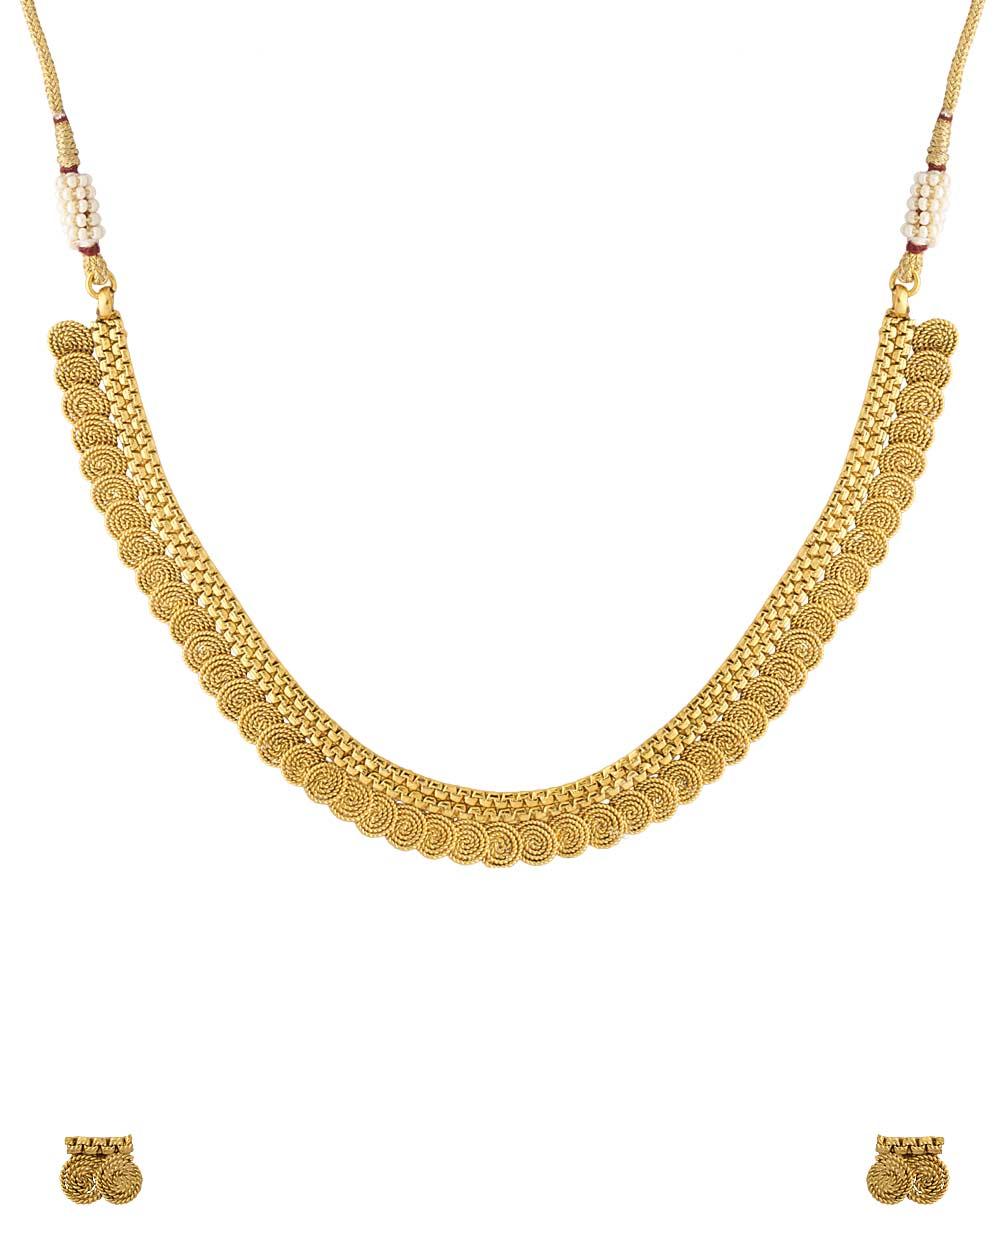 Buy Gold Plated Spiral Designer Necklace Set Online India | Voylla